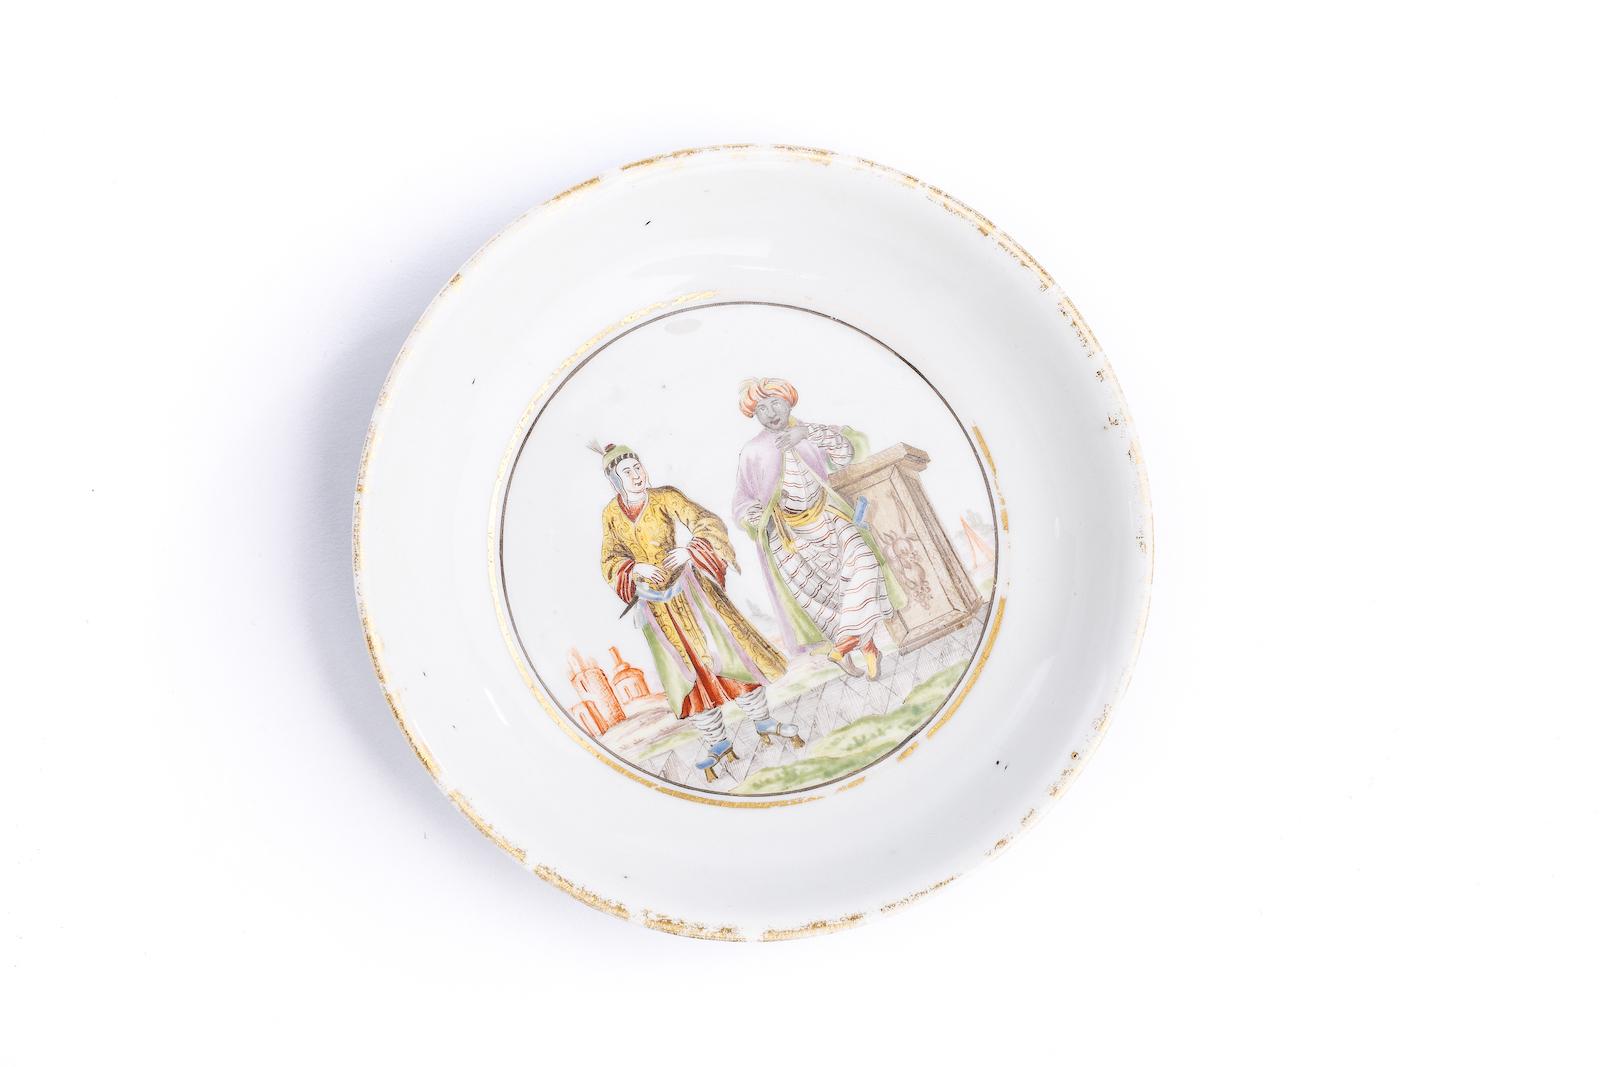 #27 Kleine Unterschale, Meissen 1720/25 | A plate decorated with two men of different cultures, Meissen 1720/25 Image